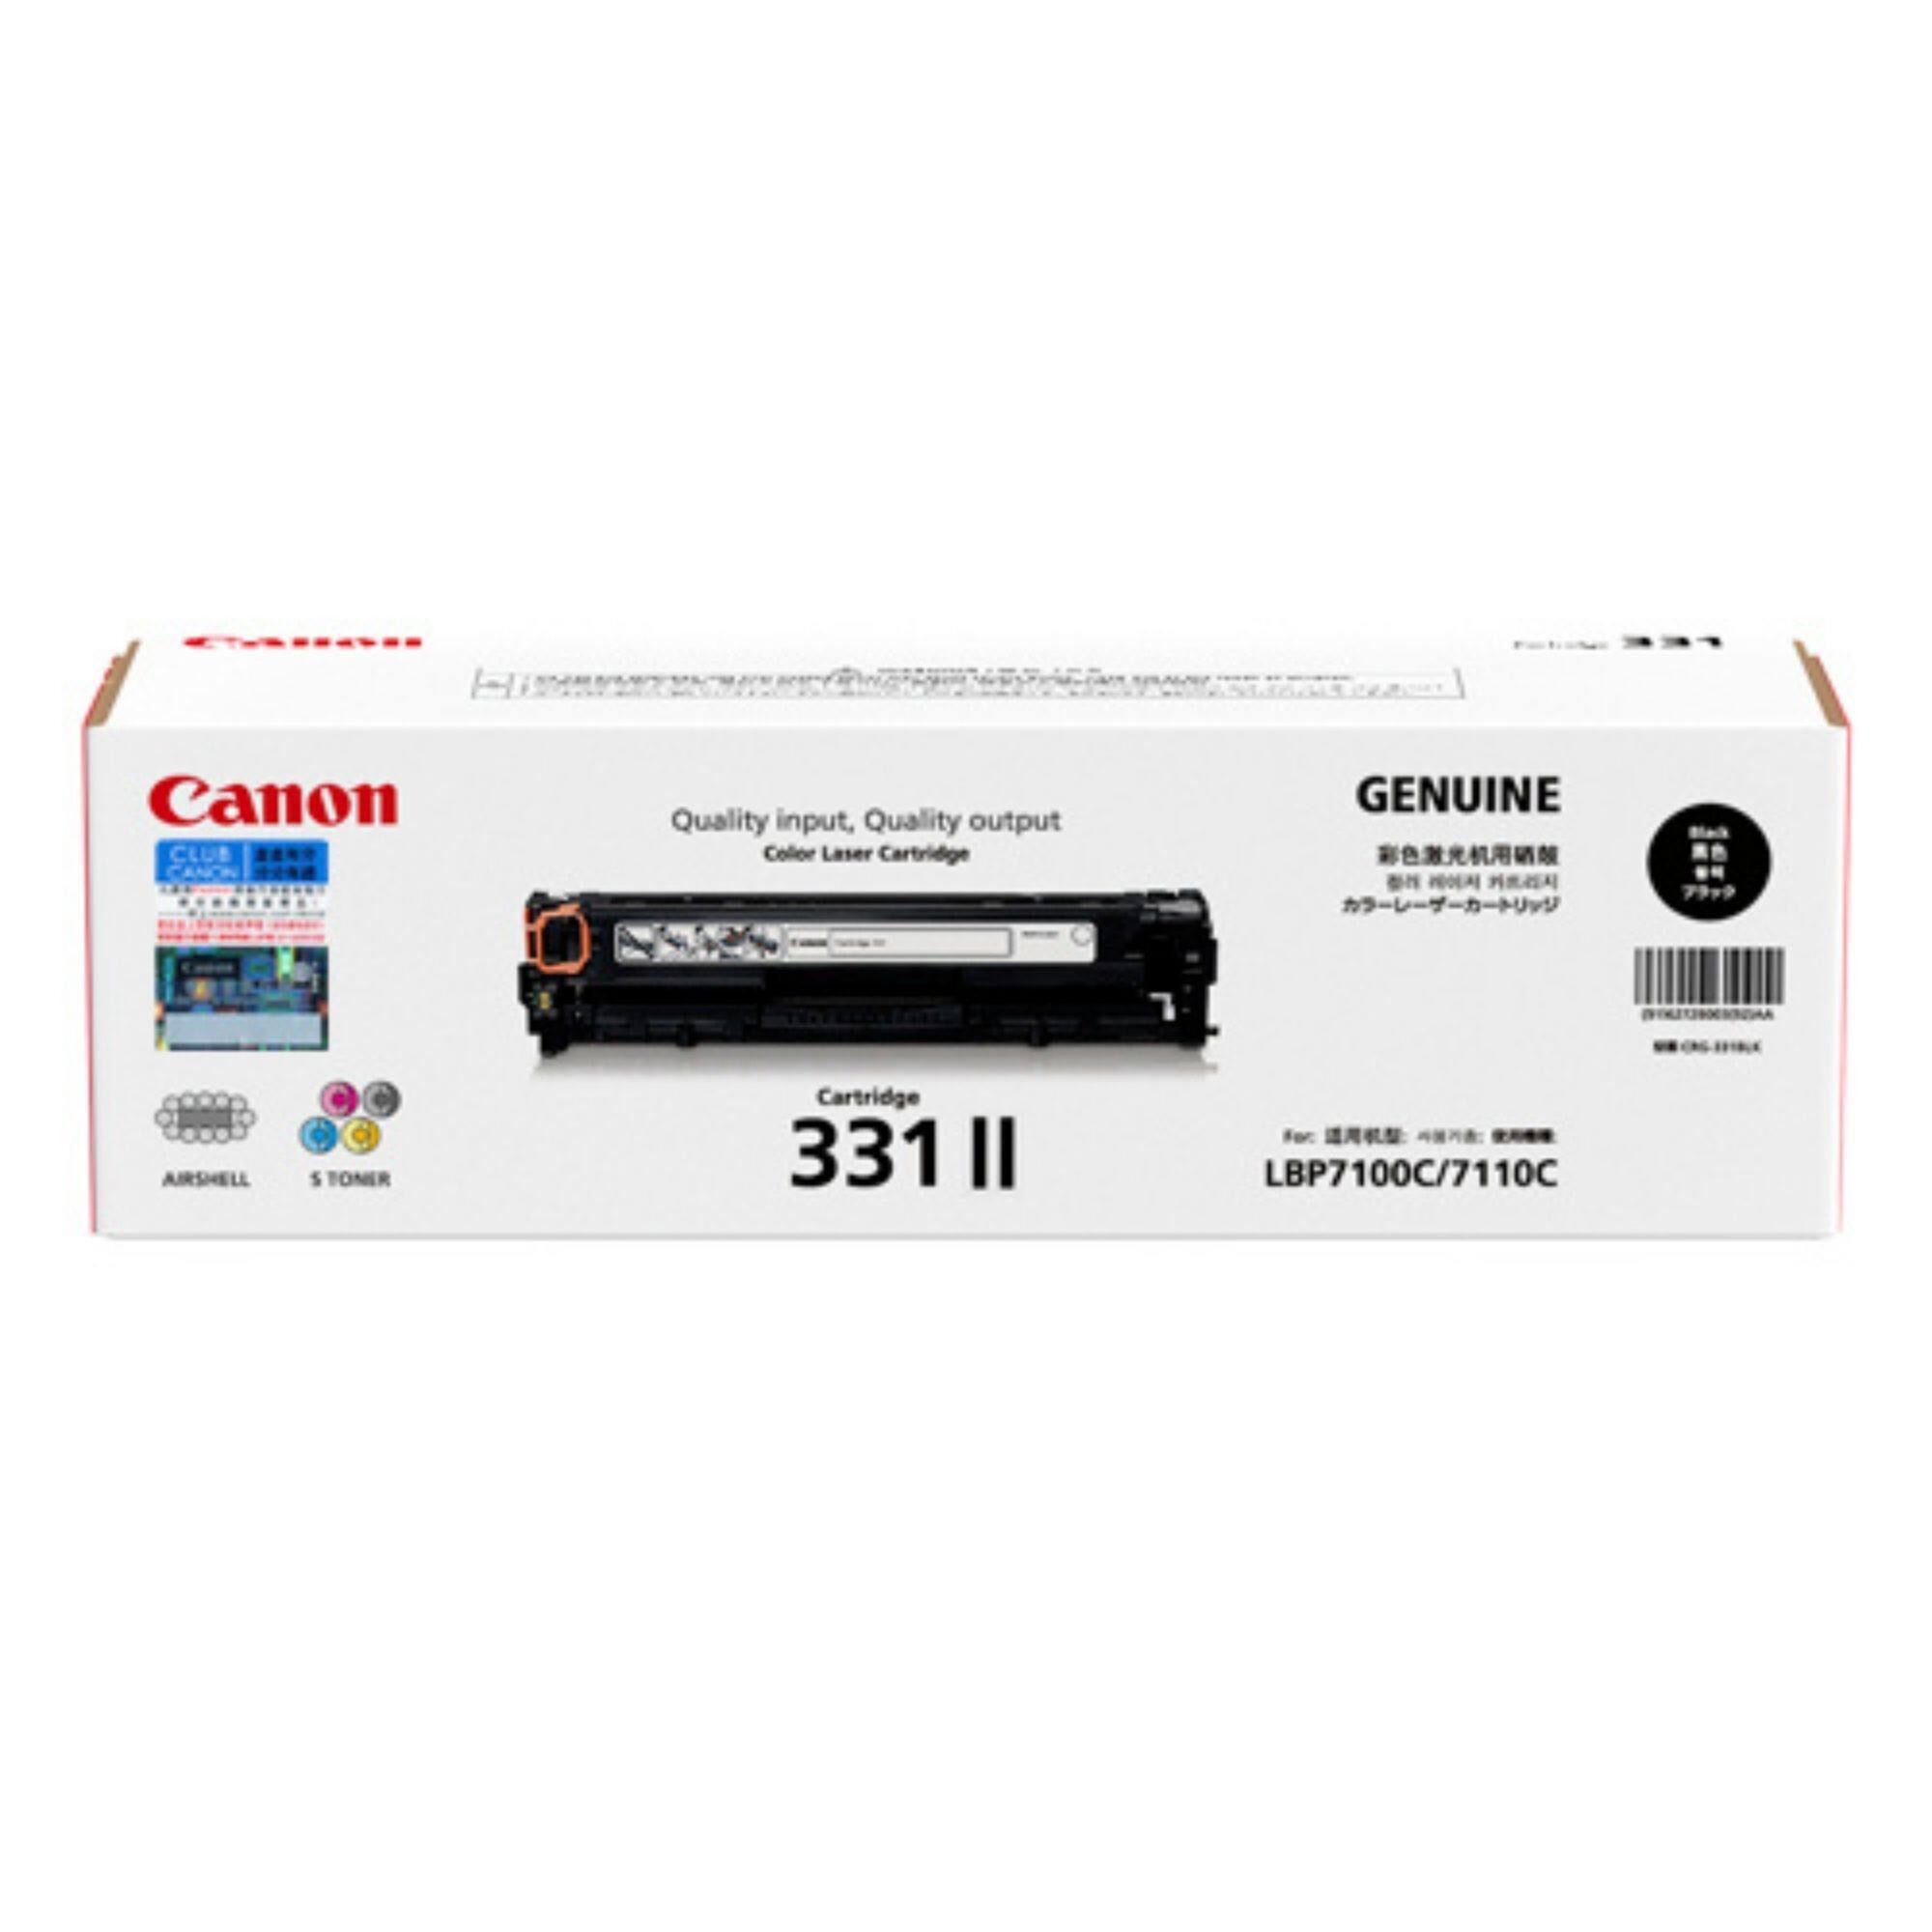 Canon Cart 331 ll Black Toner for LBP7100Cn/LBP7110Cw/MF621Cn/MF628Cw/MF8210Cn/MF8280Cw Printer